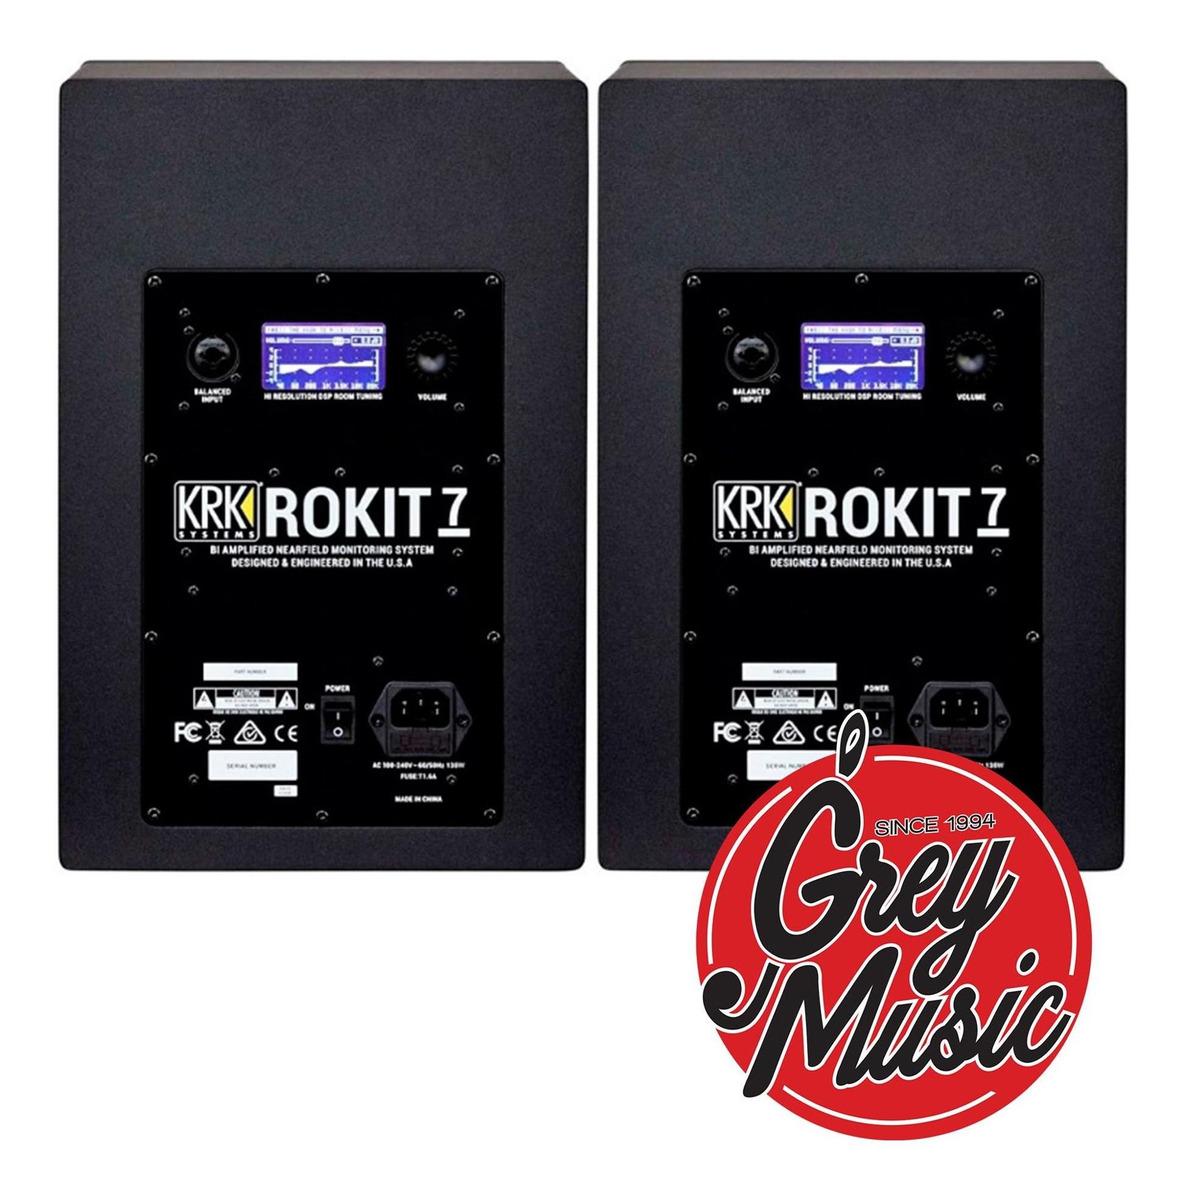 Monitor De Studio Krk Rp7g4 Rokit 7 Generacion 4 Color Negro